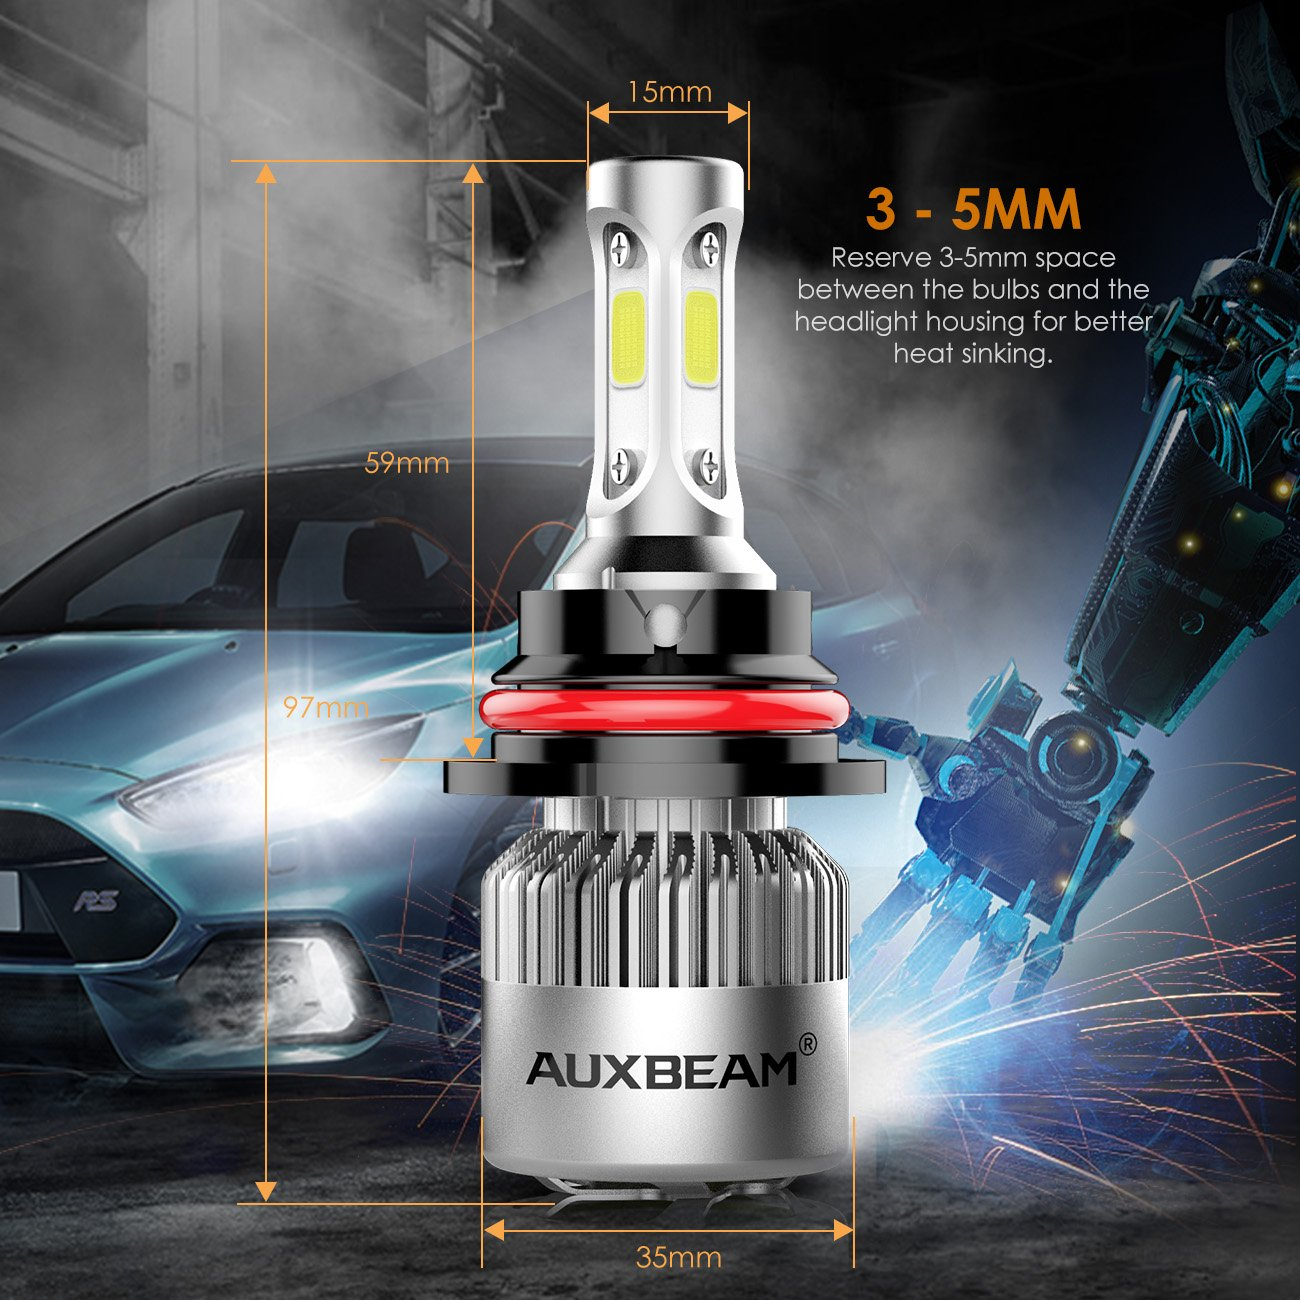 Auxbeam 9004 Led Headlight Bulbs F-S2 Series LED Headlights with 2 Pcs of HB1 LED Headlight Bulbs 72W 8000lm COB Led Chips Hi-Lo Beam